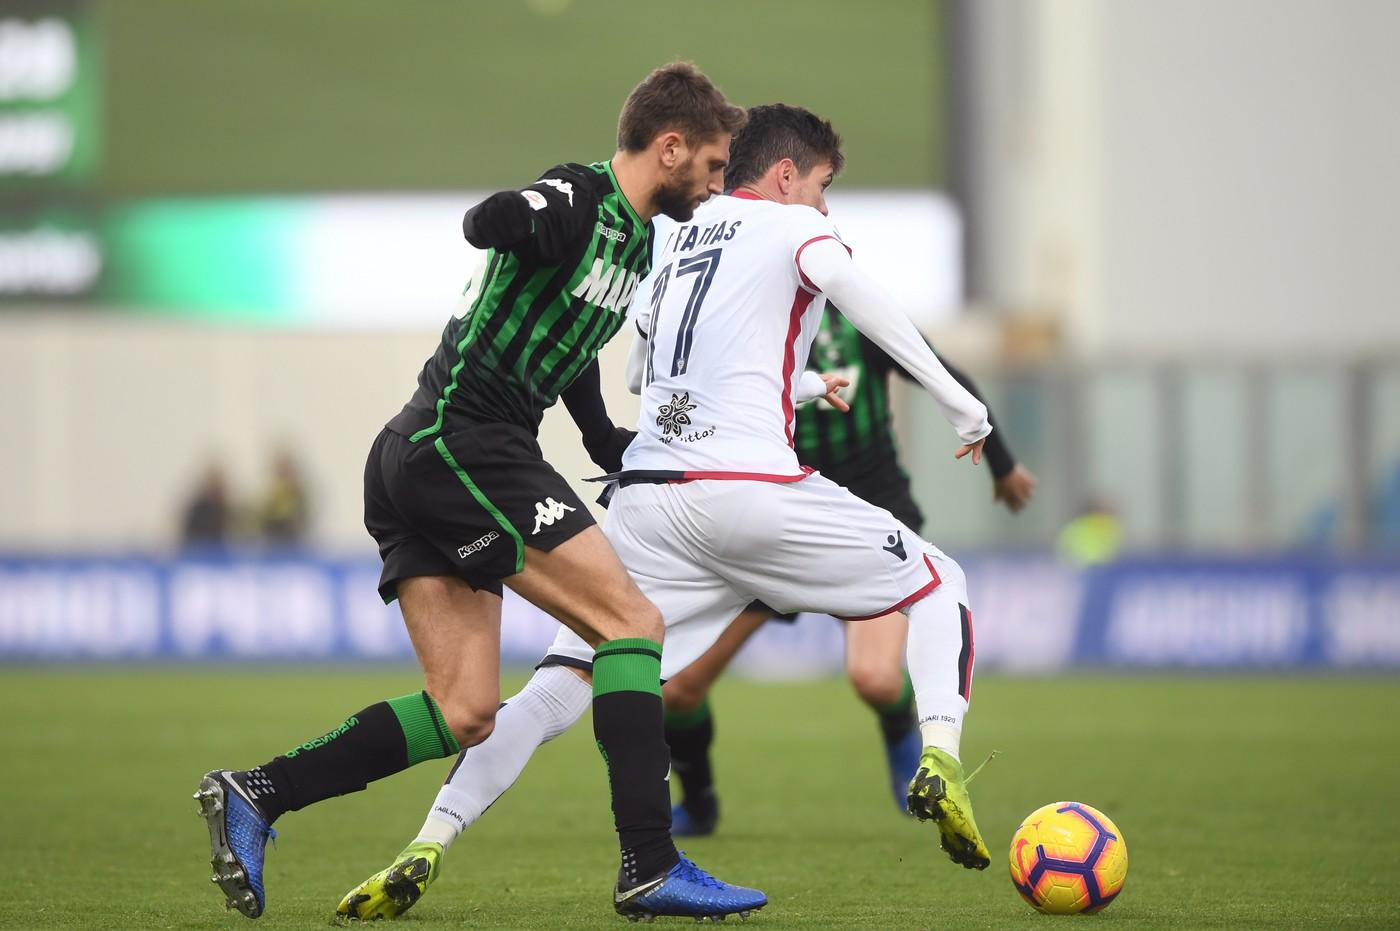 Massimo Paolone/LaPresse